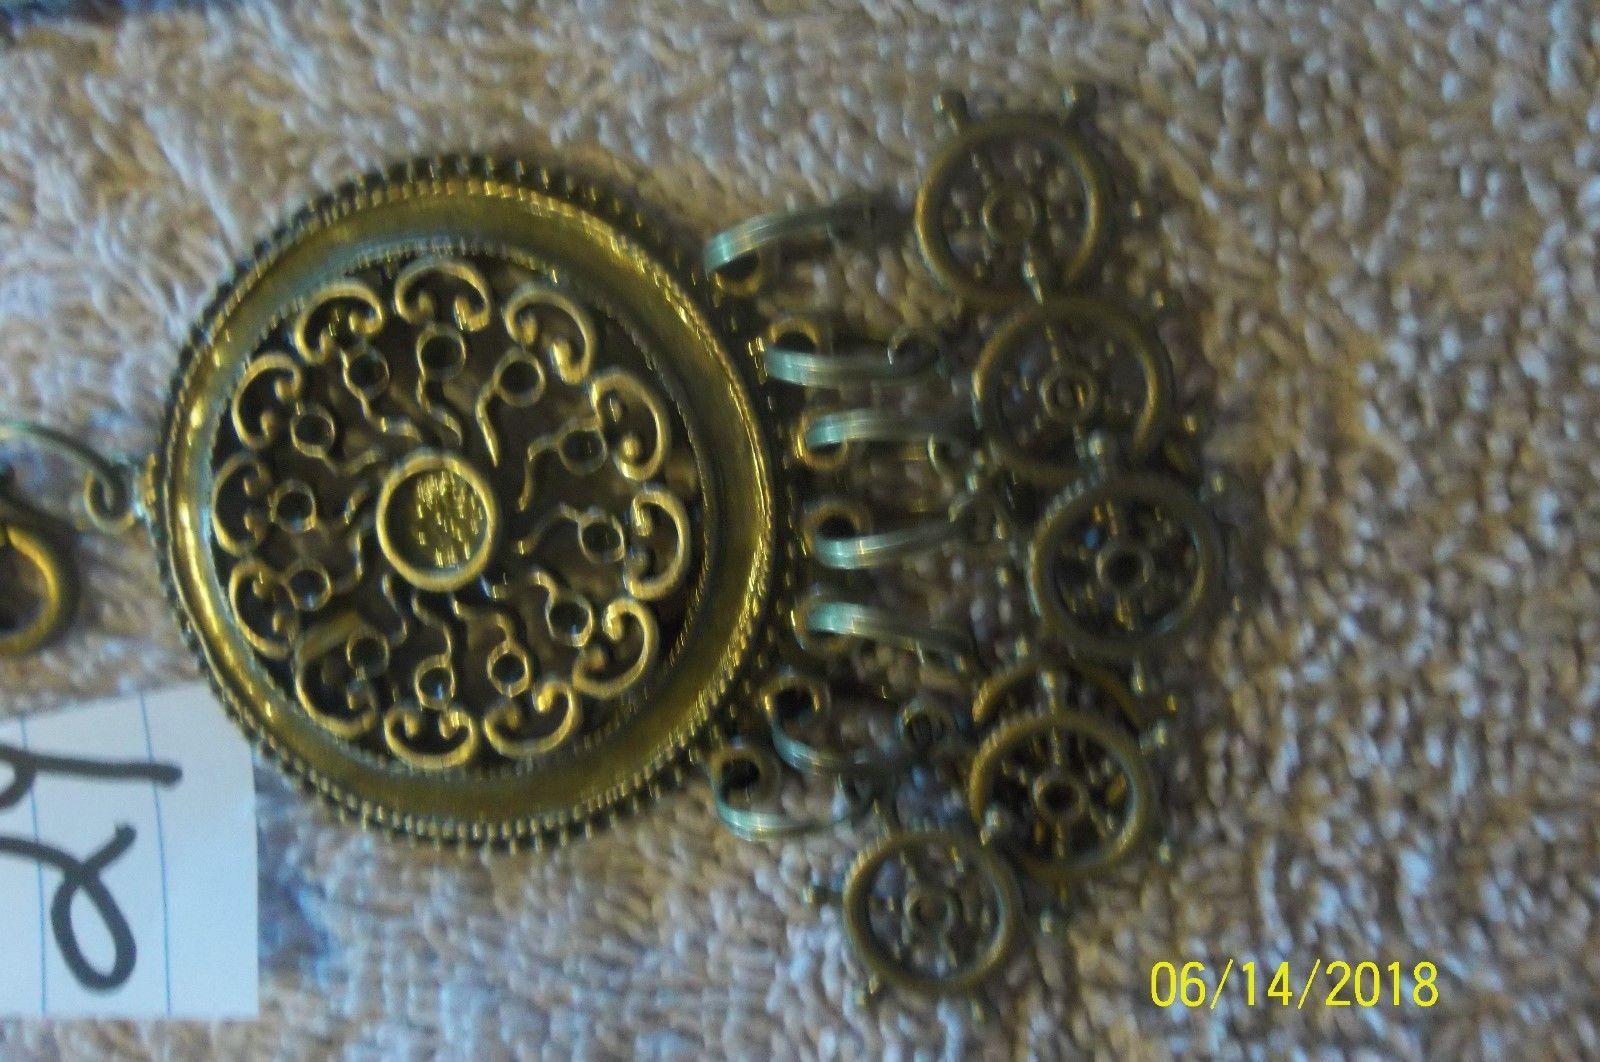 # purse jewlrey bronze color keychain backpack filigree dangle charms #24 image 3